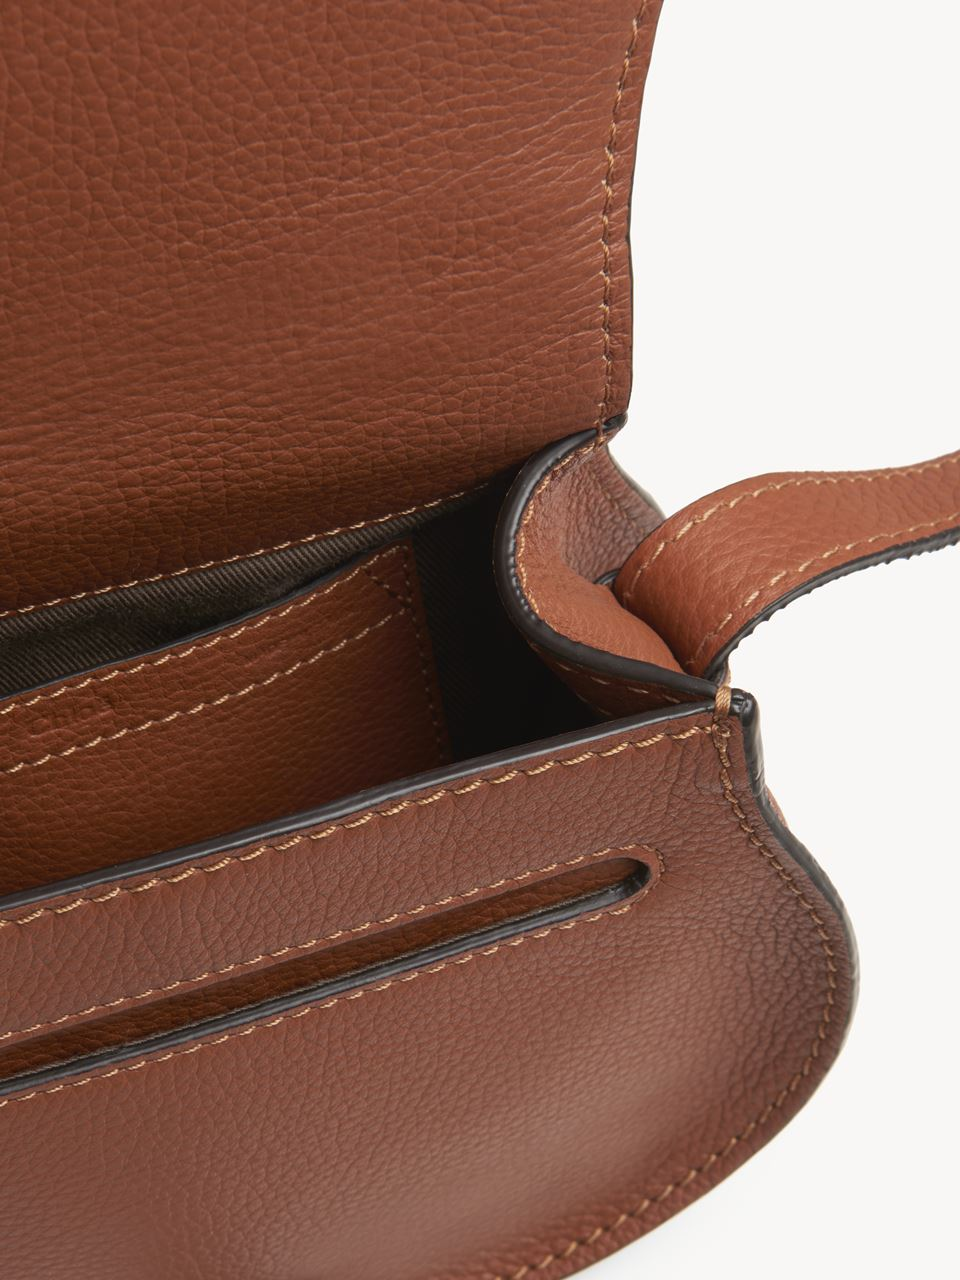 fake chloe purse - Chlo�� Mini Marcie Bag, Women\u0026#39;s Bags | Chlo�� Official Website ...